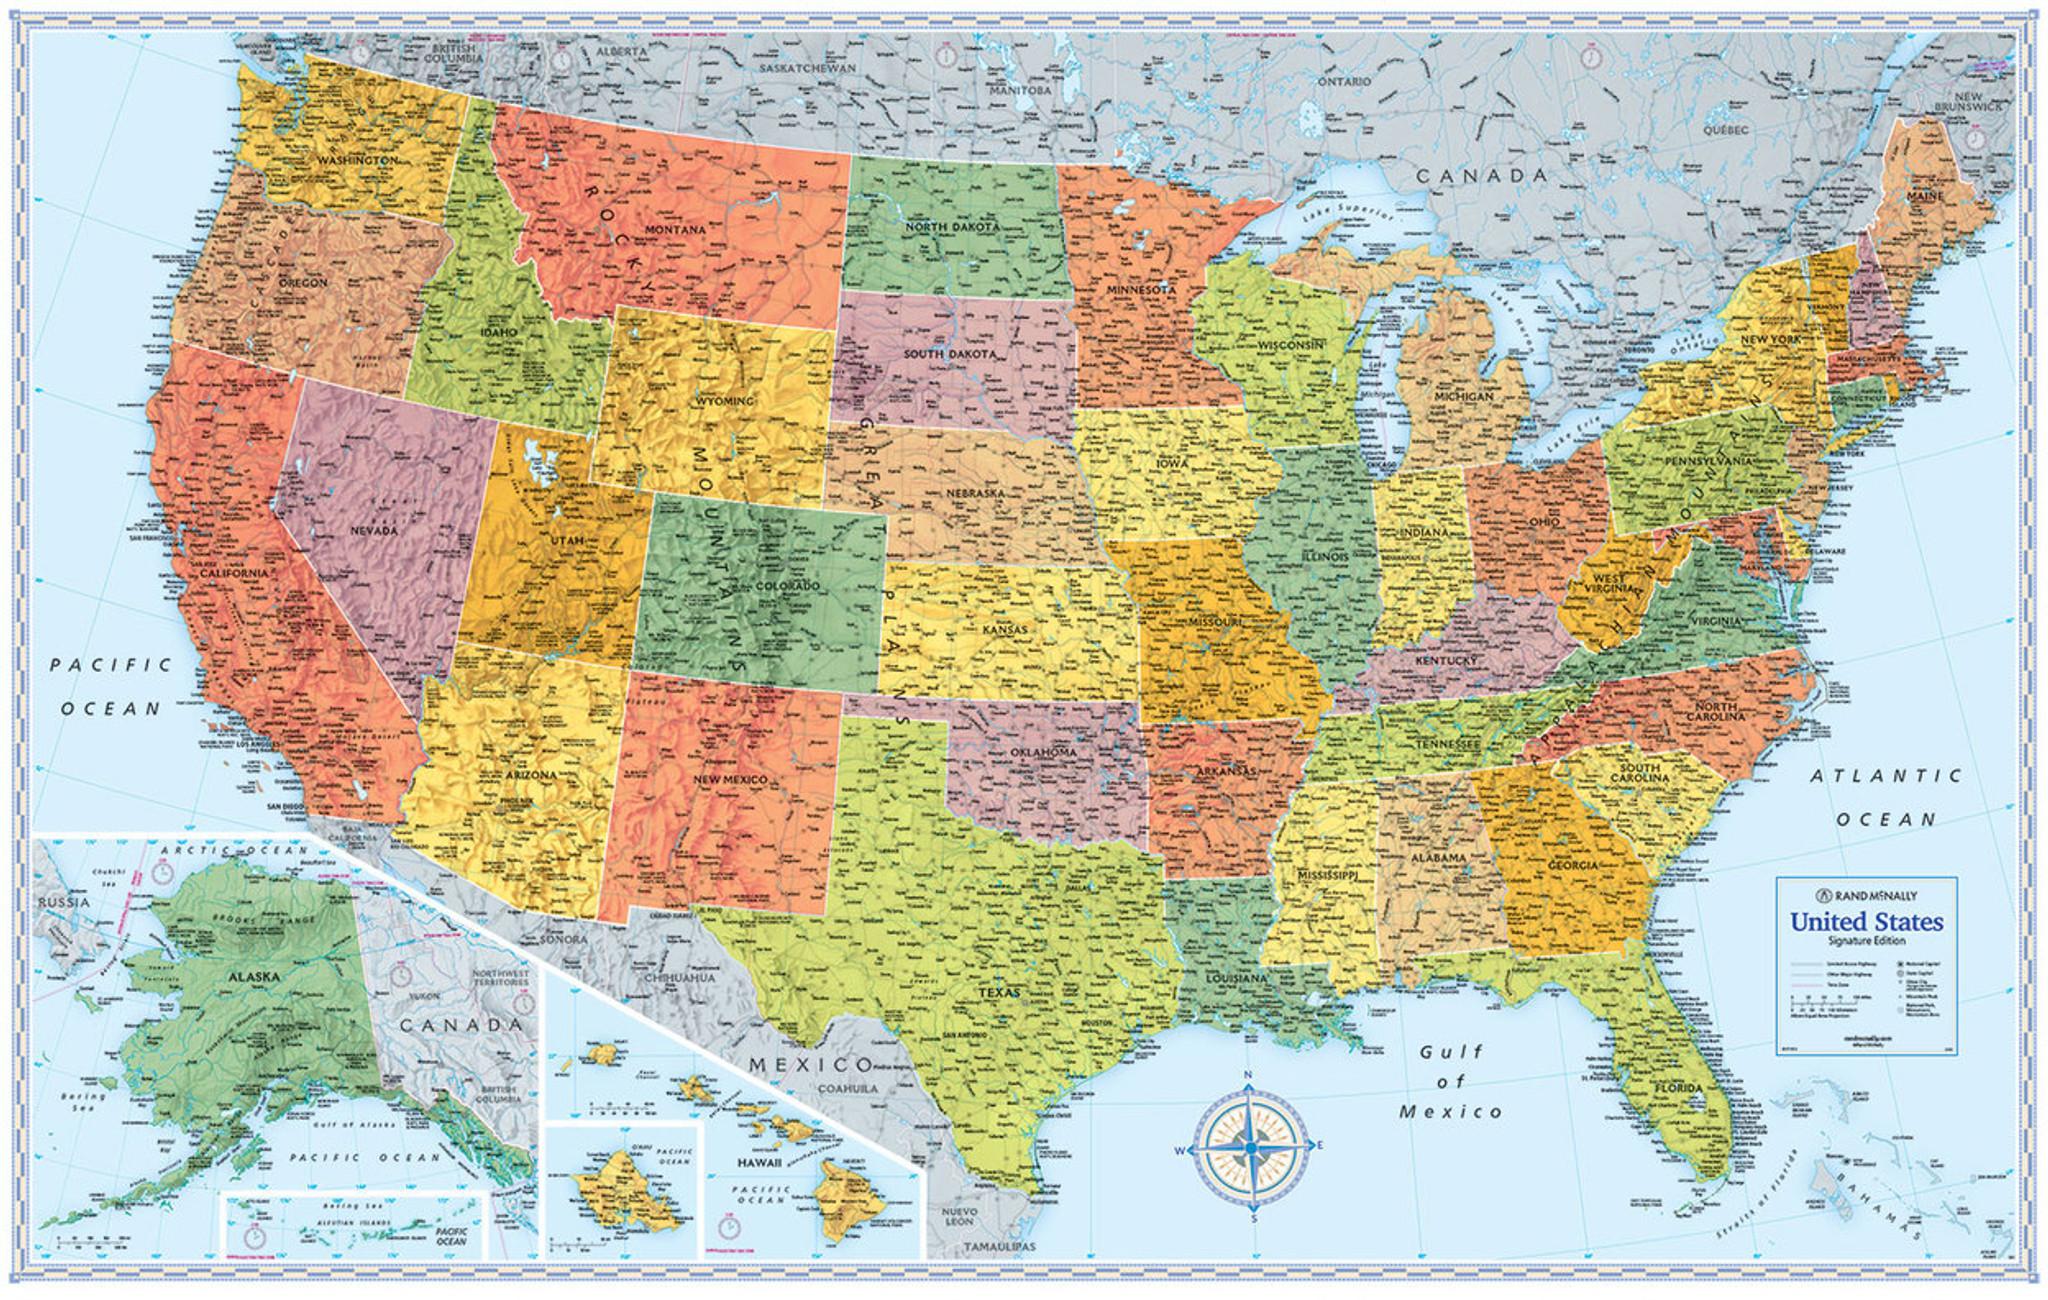 Signature Edition US Wall Maps Rand McNally Store - Us map stencil